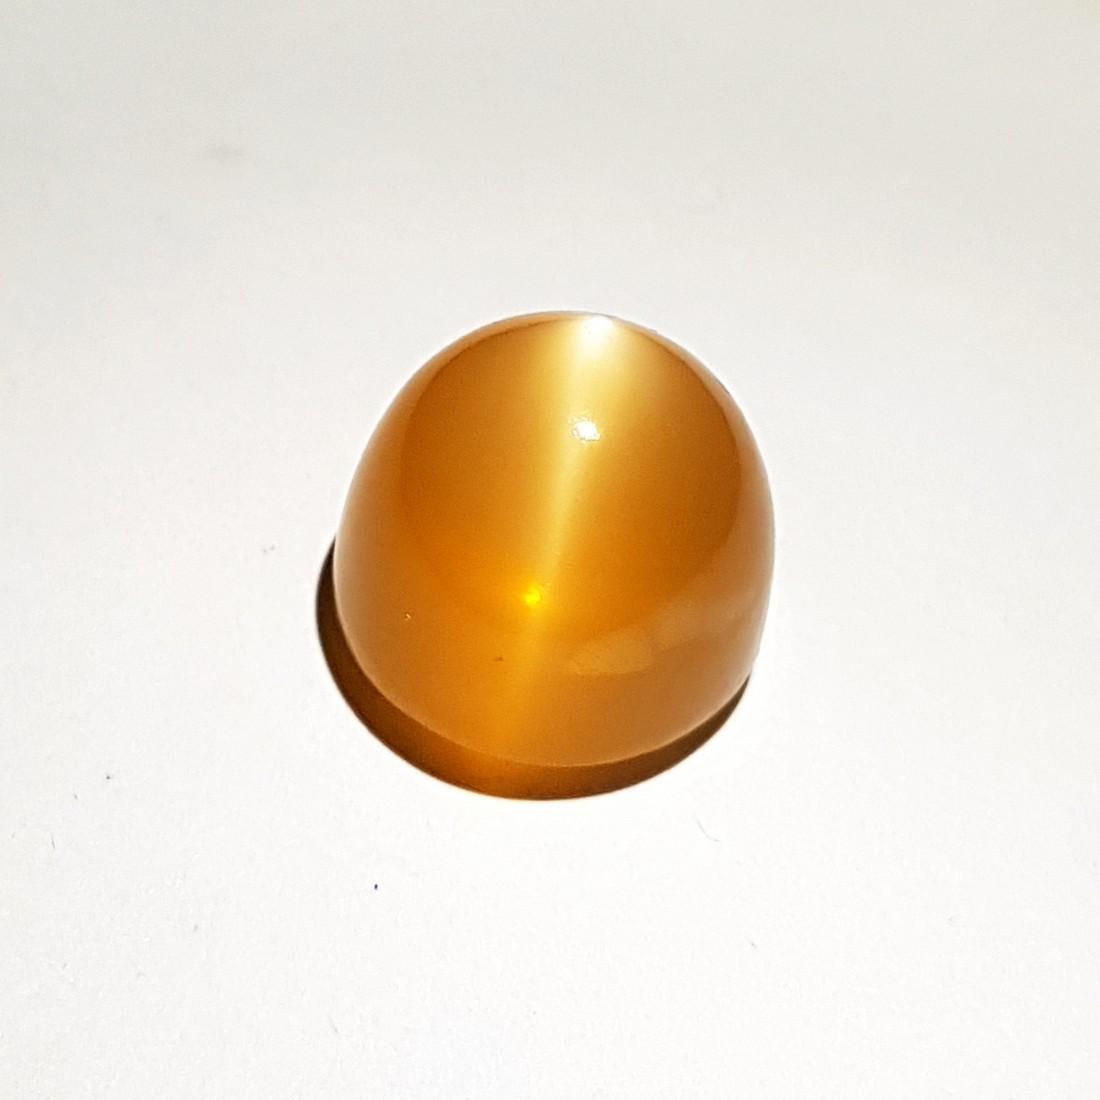 Orange Candy Moonstone Cat's Eye - 16.00 ct - 2